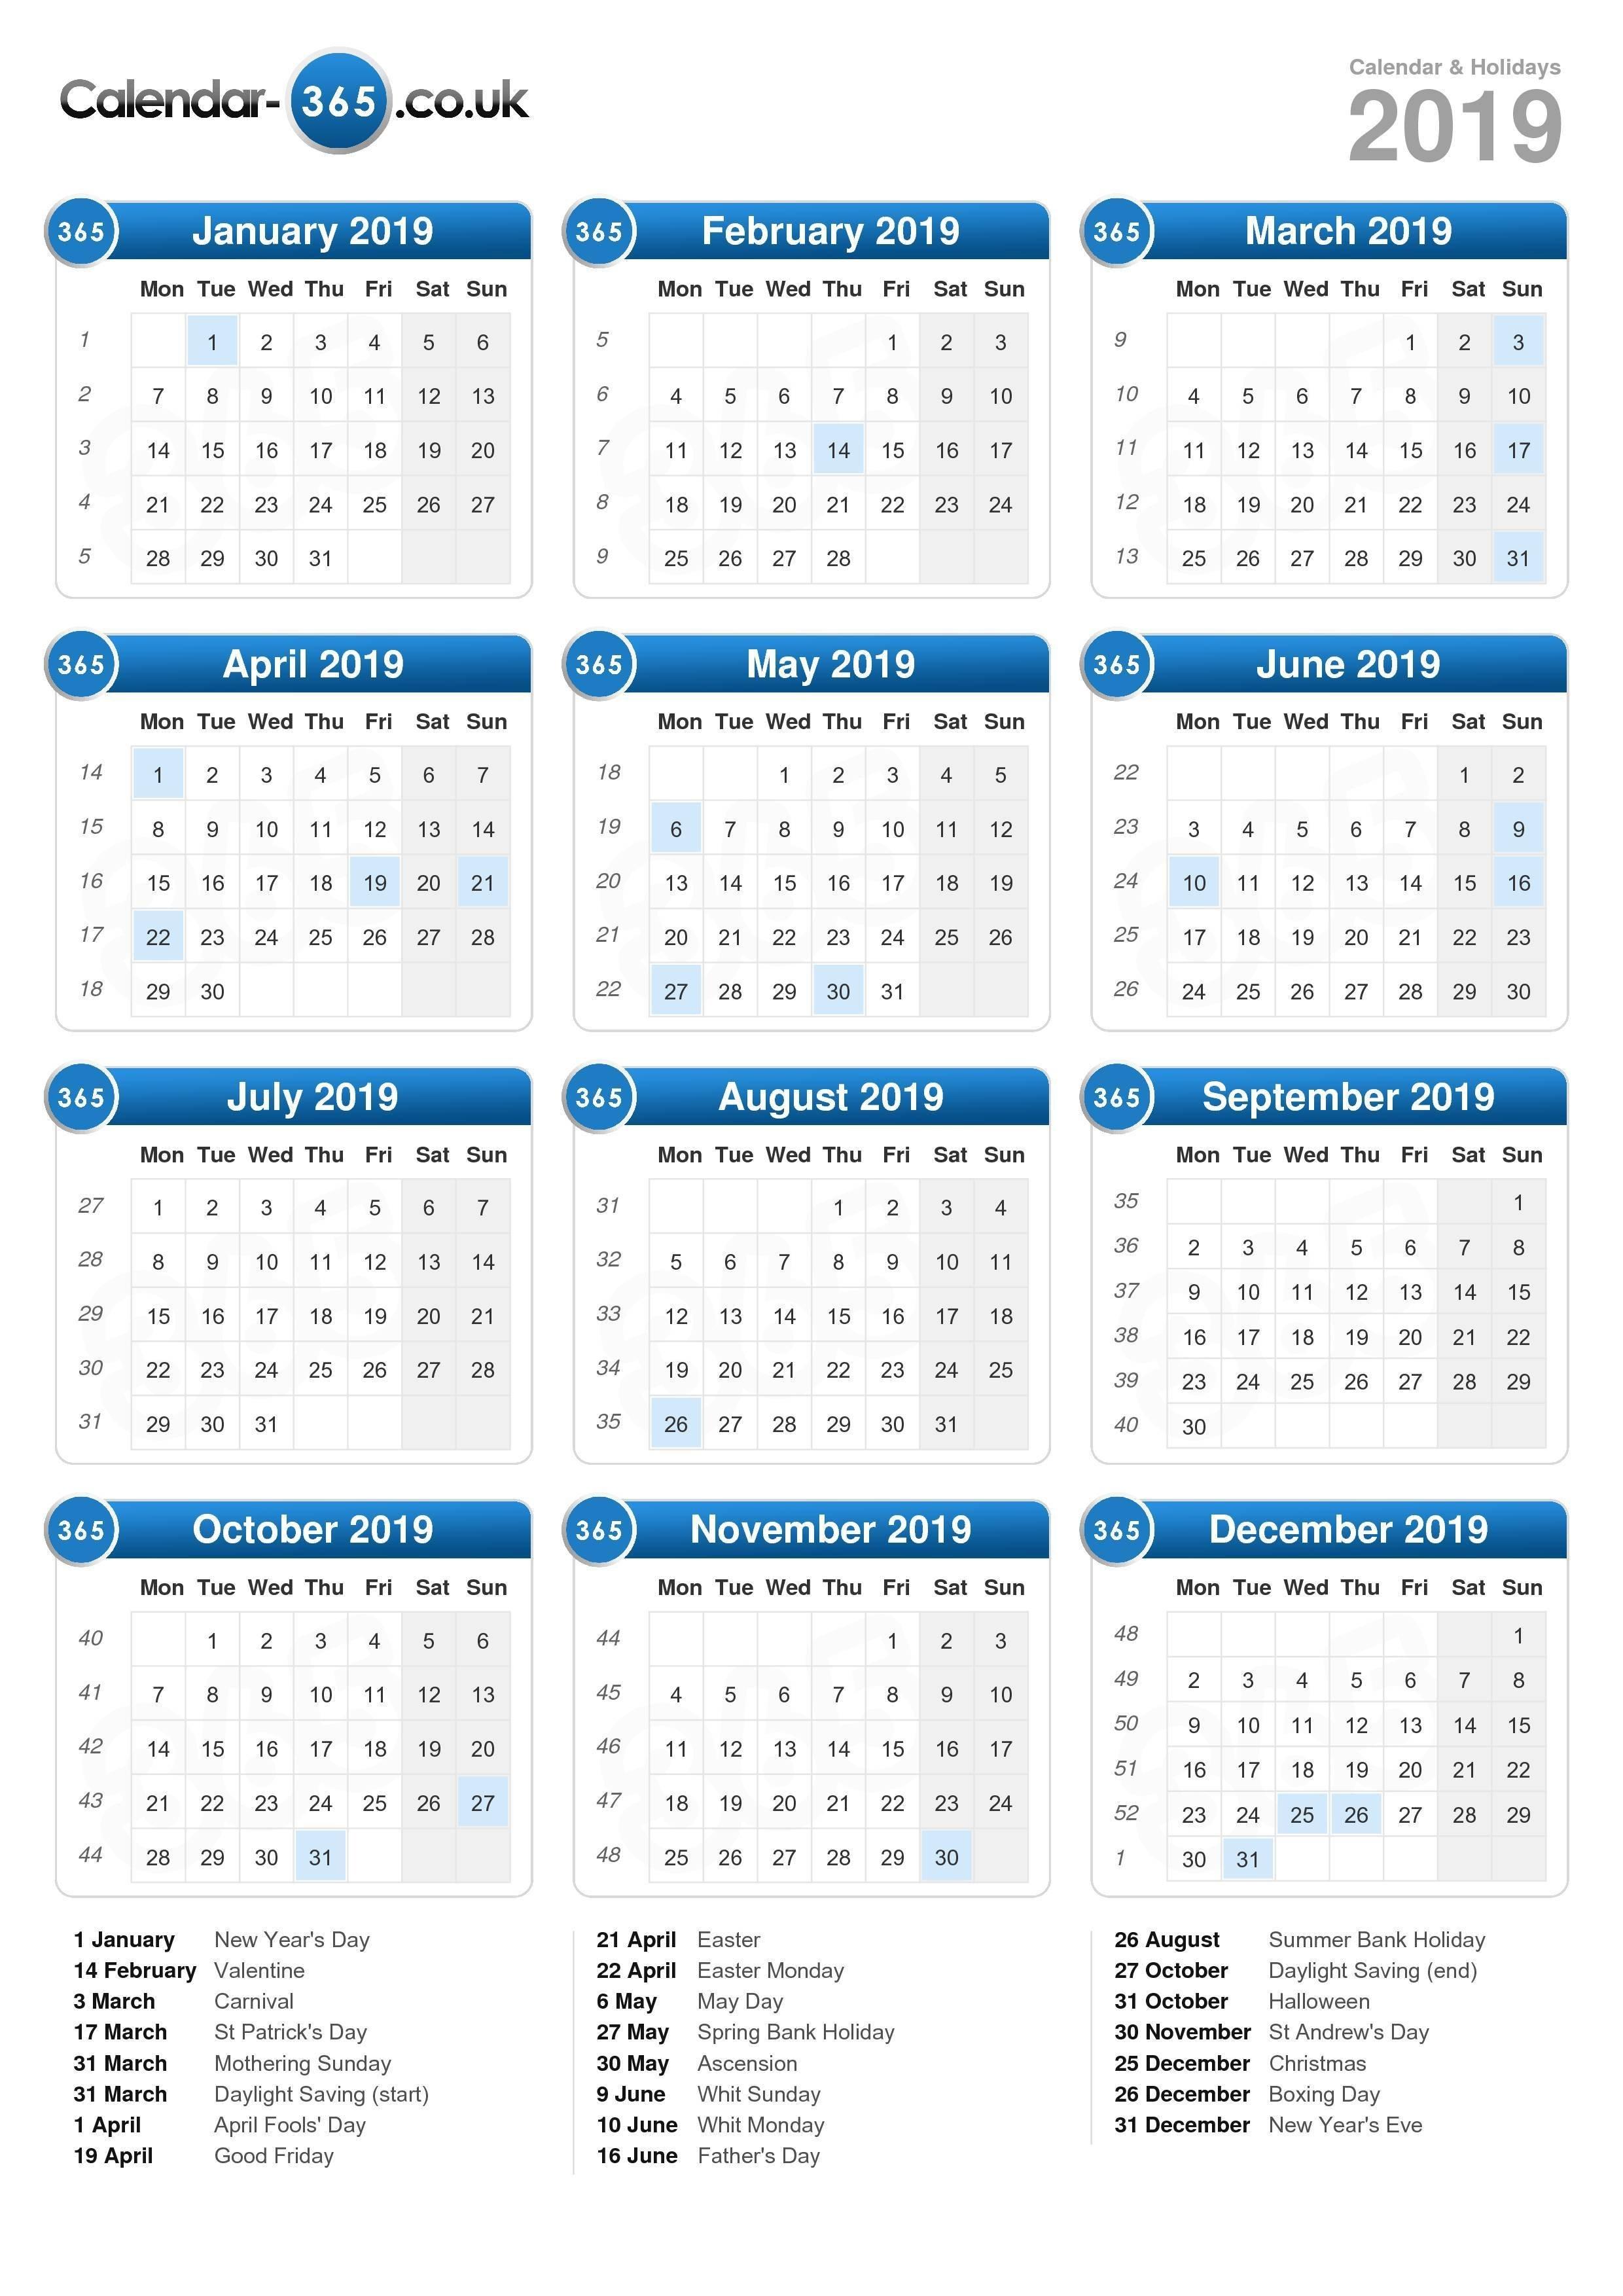 Calendar 2019 Calendar 2019 Good Friday